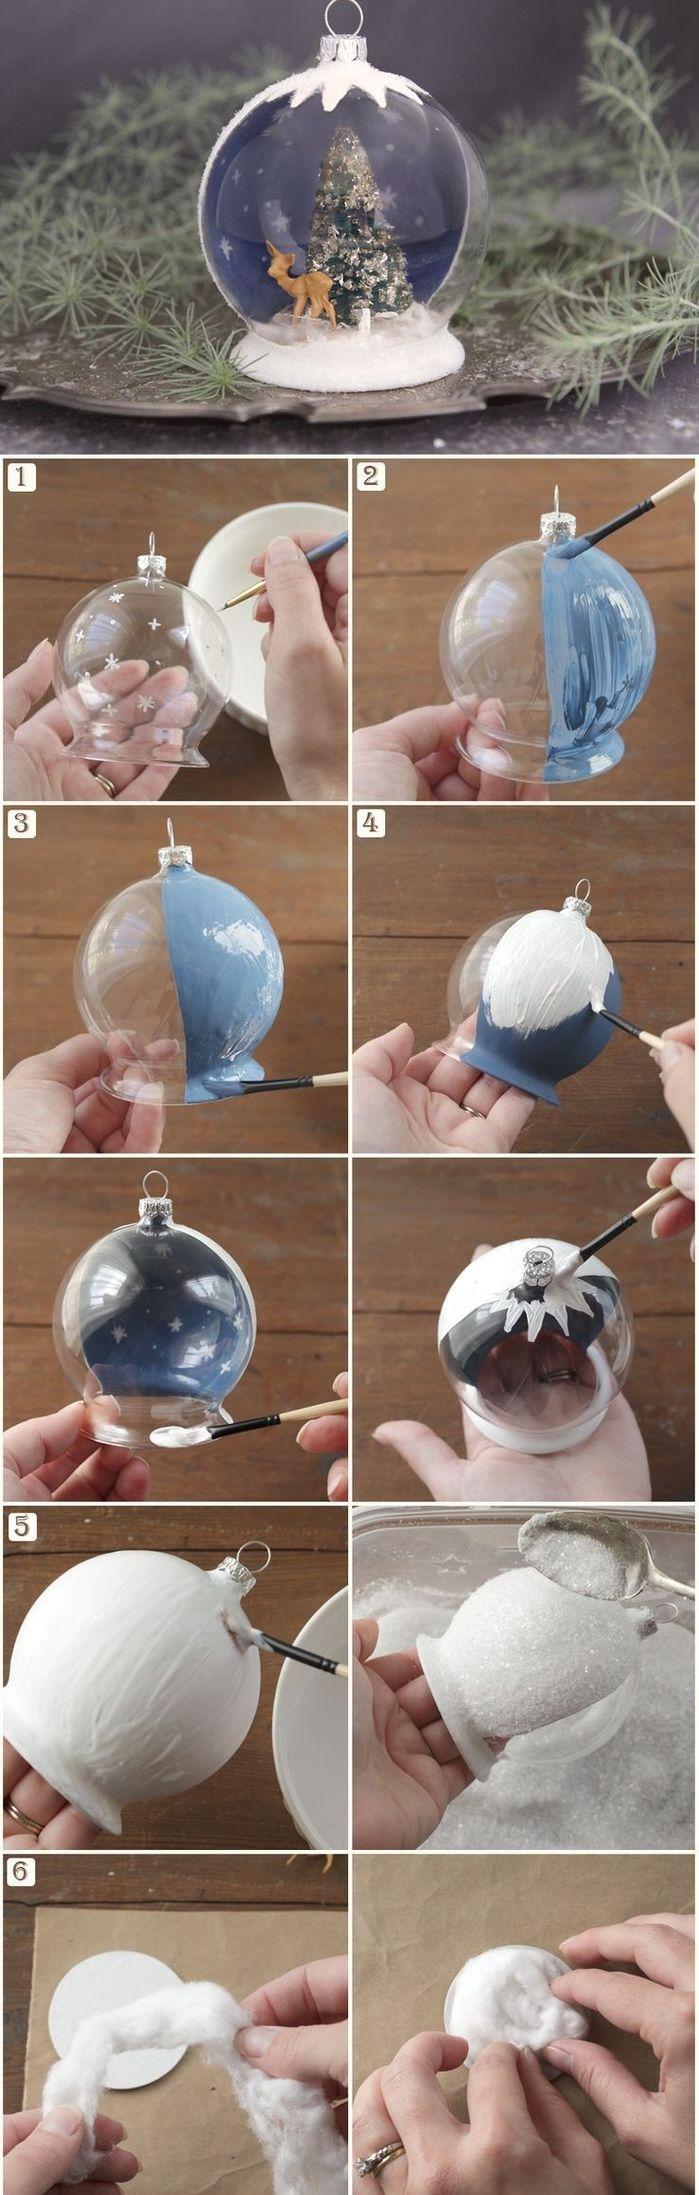 80 best diy boule neige images on pinterest xmas christmas crafts and la la la. Black Bedroom Furniture Sets. Home Design Ideas